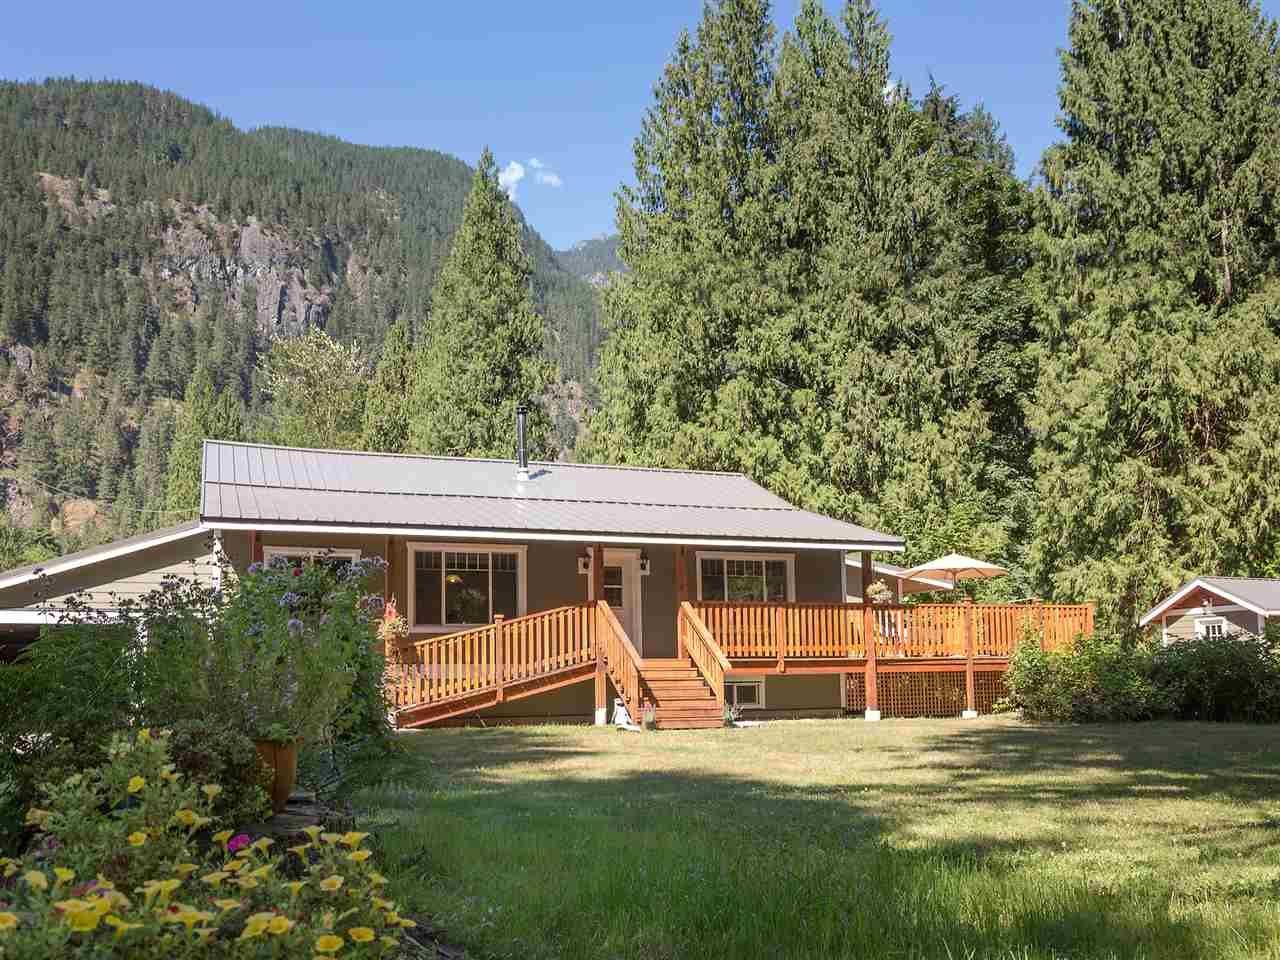 Main Photo: 14848 SQUAMISH VALLEY ROAD in Squamish: Upper Squamish House for sale : MLS®# R2193878